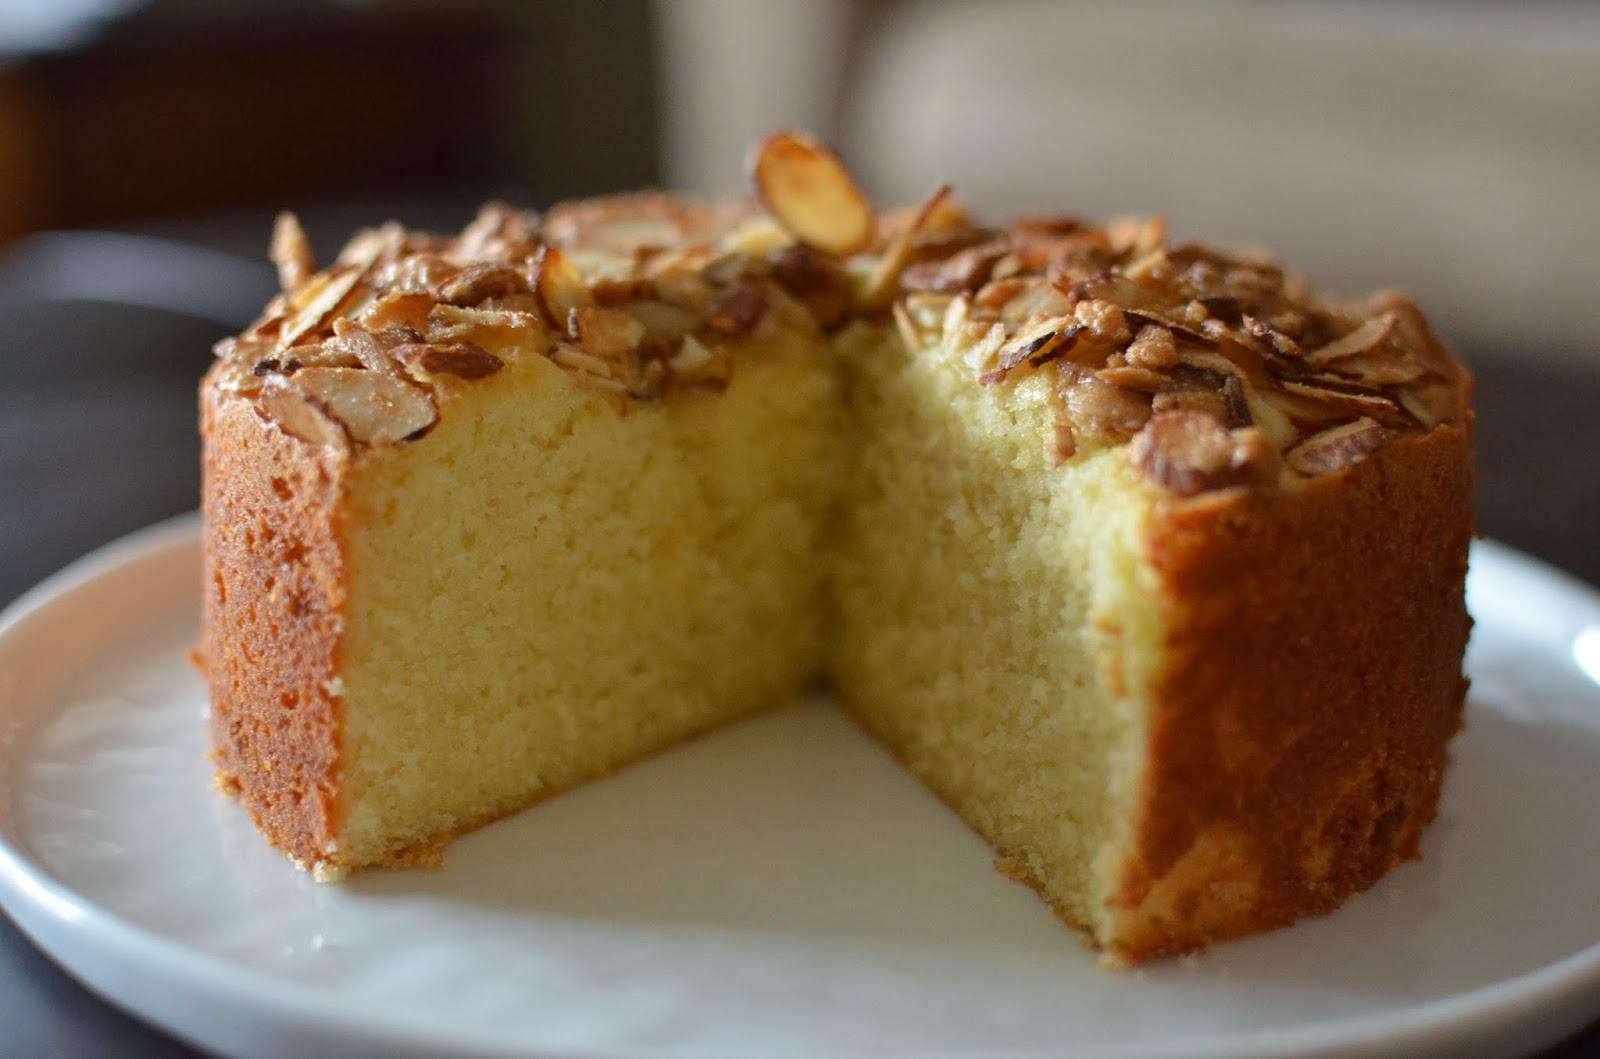 Butter Flour Paste For Cake Pan